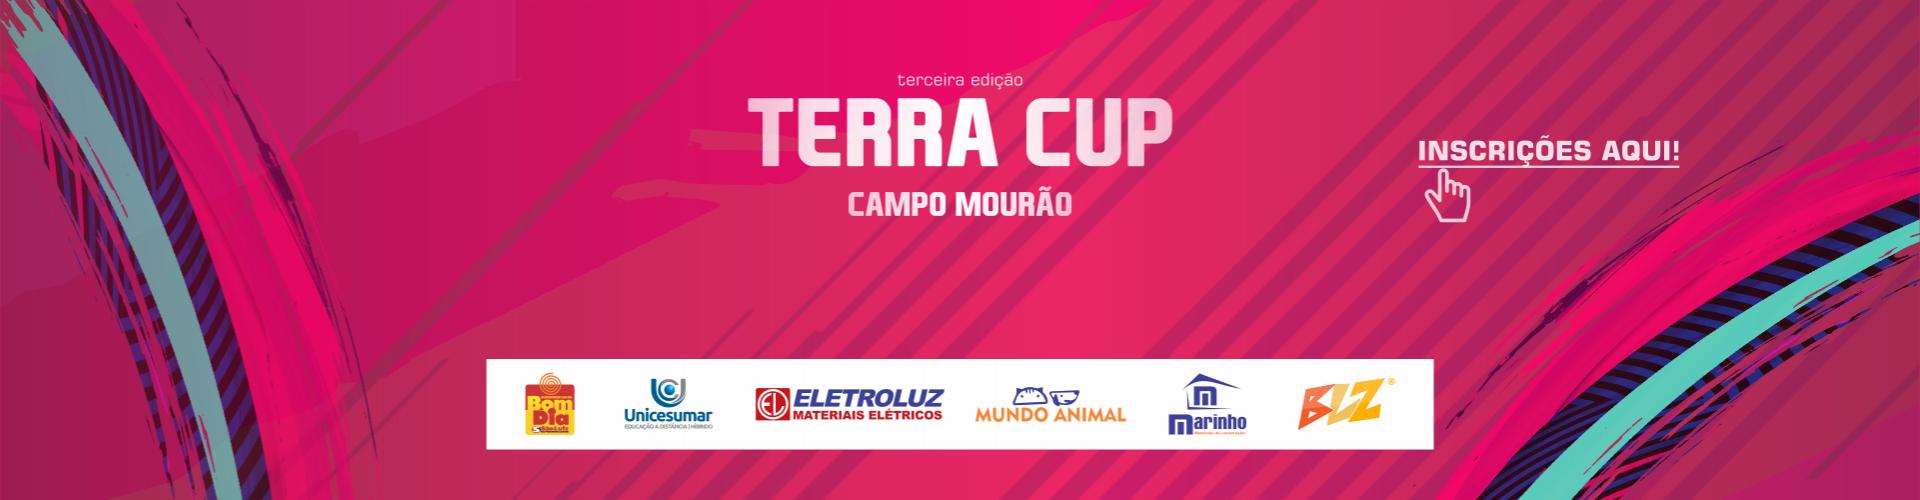 Terra Cup 3ª edição – 20/07